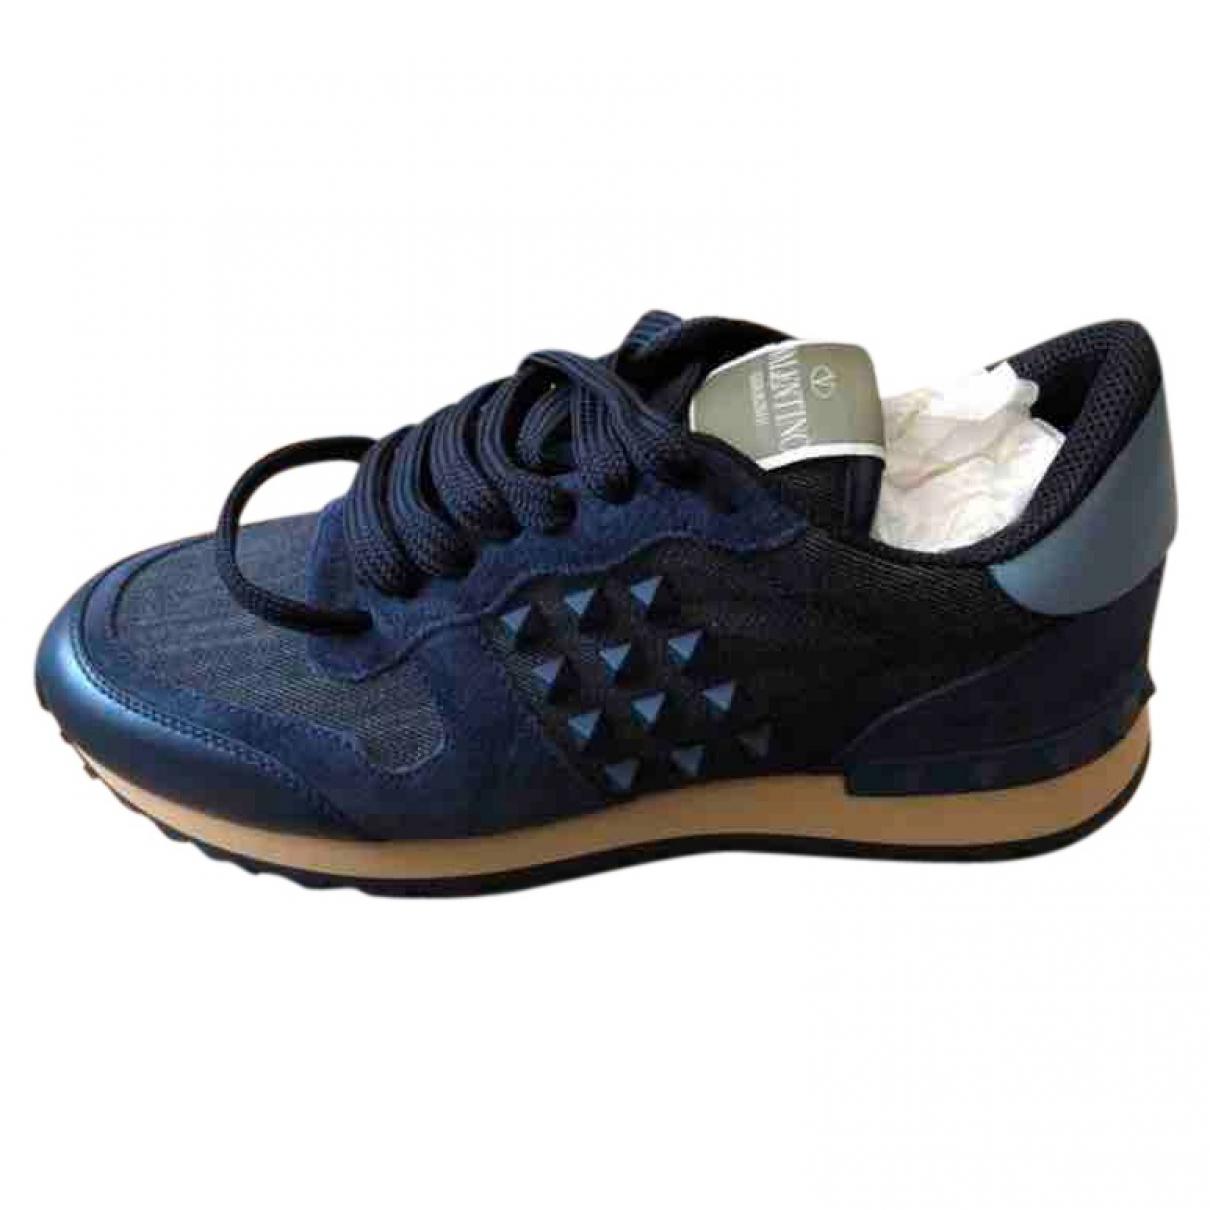 Valentino Garavani - Baskets Rockrunner pour femme en toile - bleu